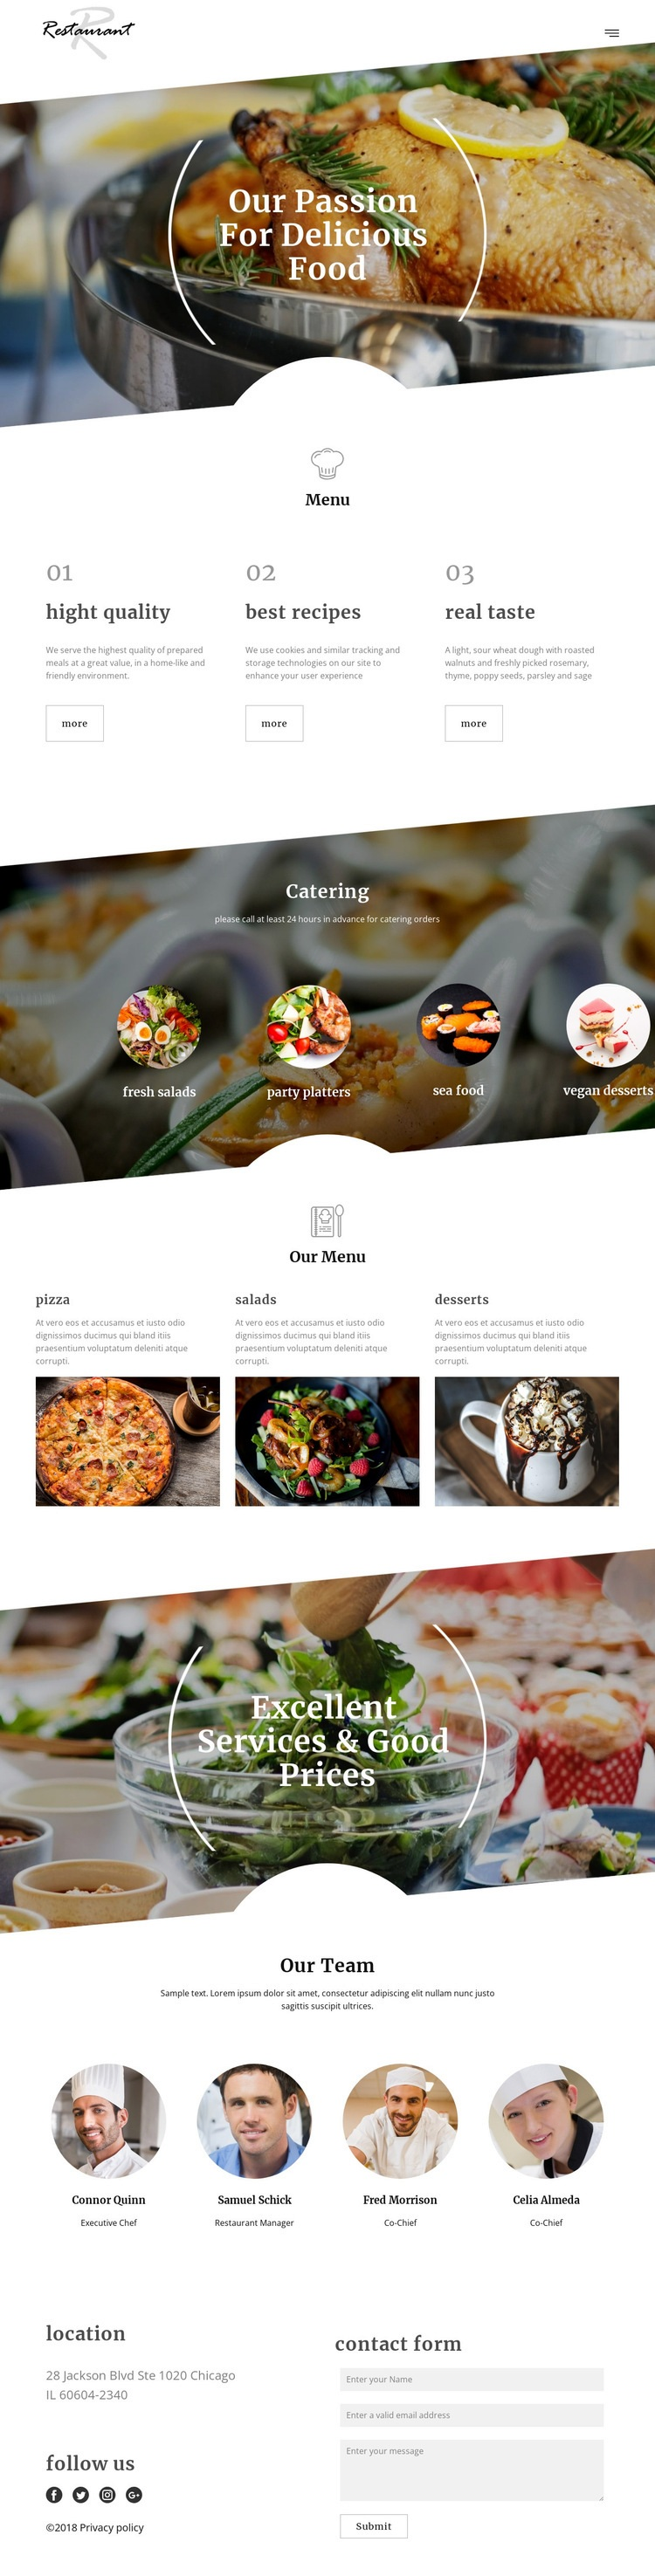 Executive chef recipes Html Code Example